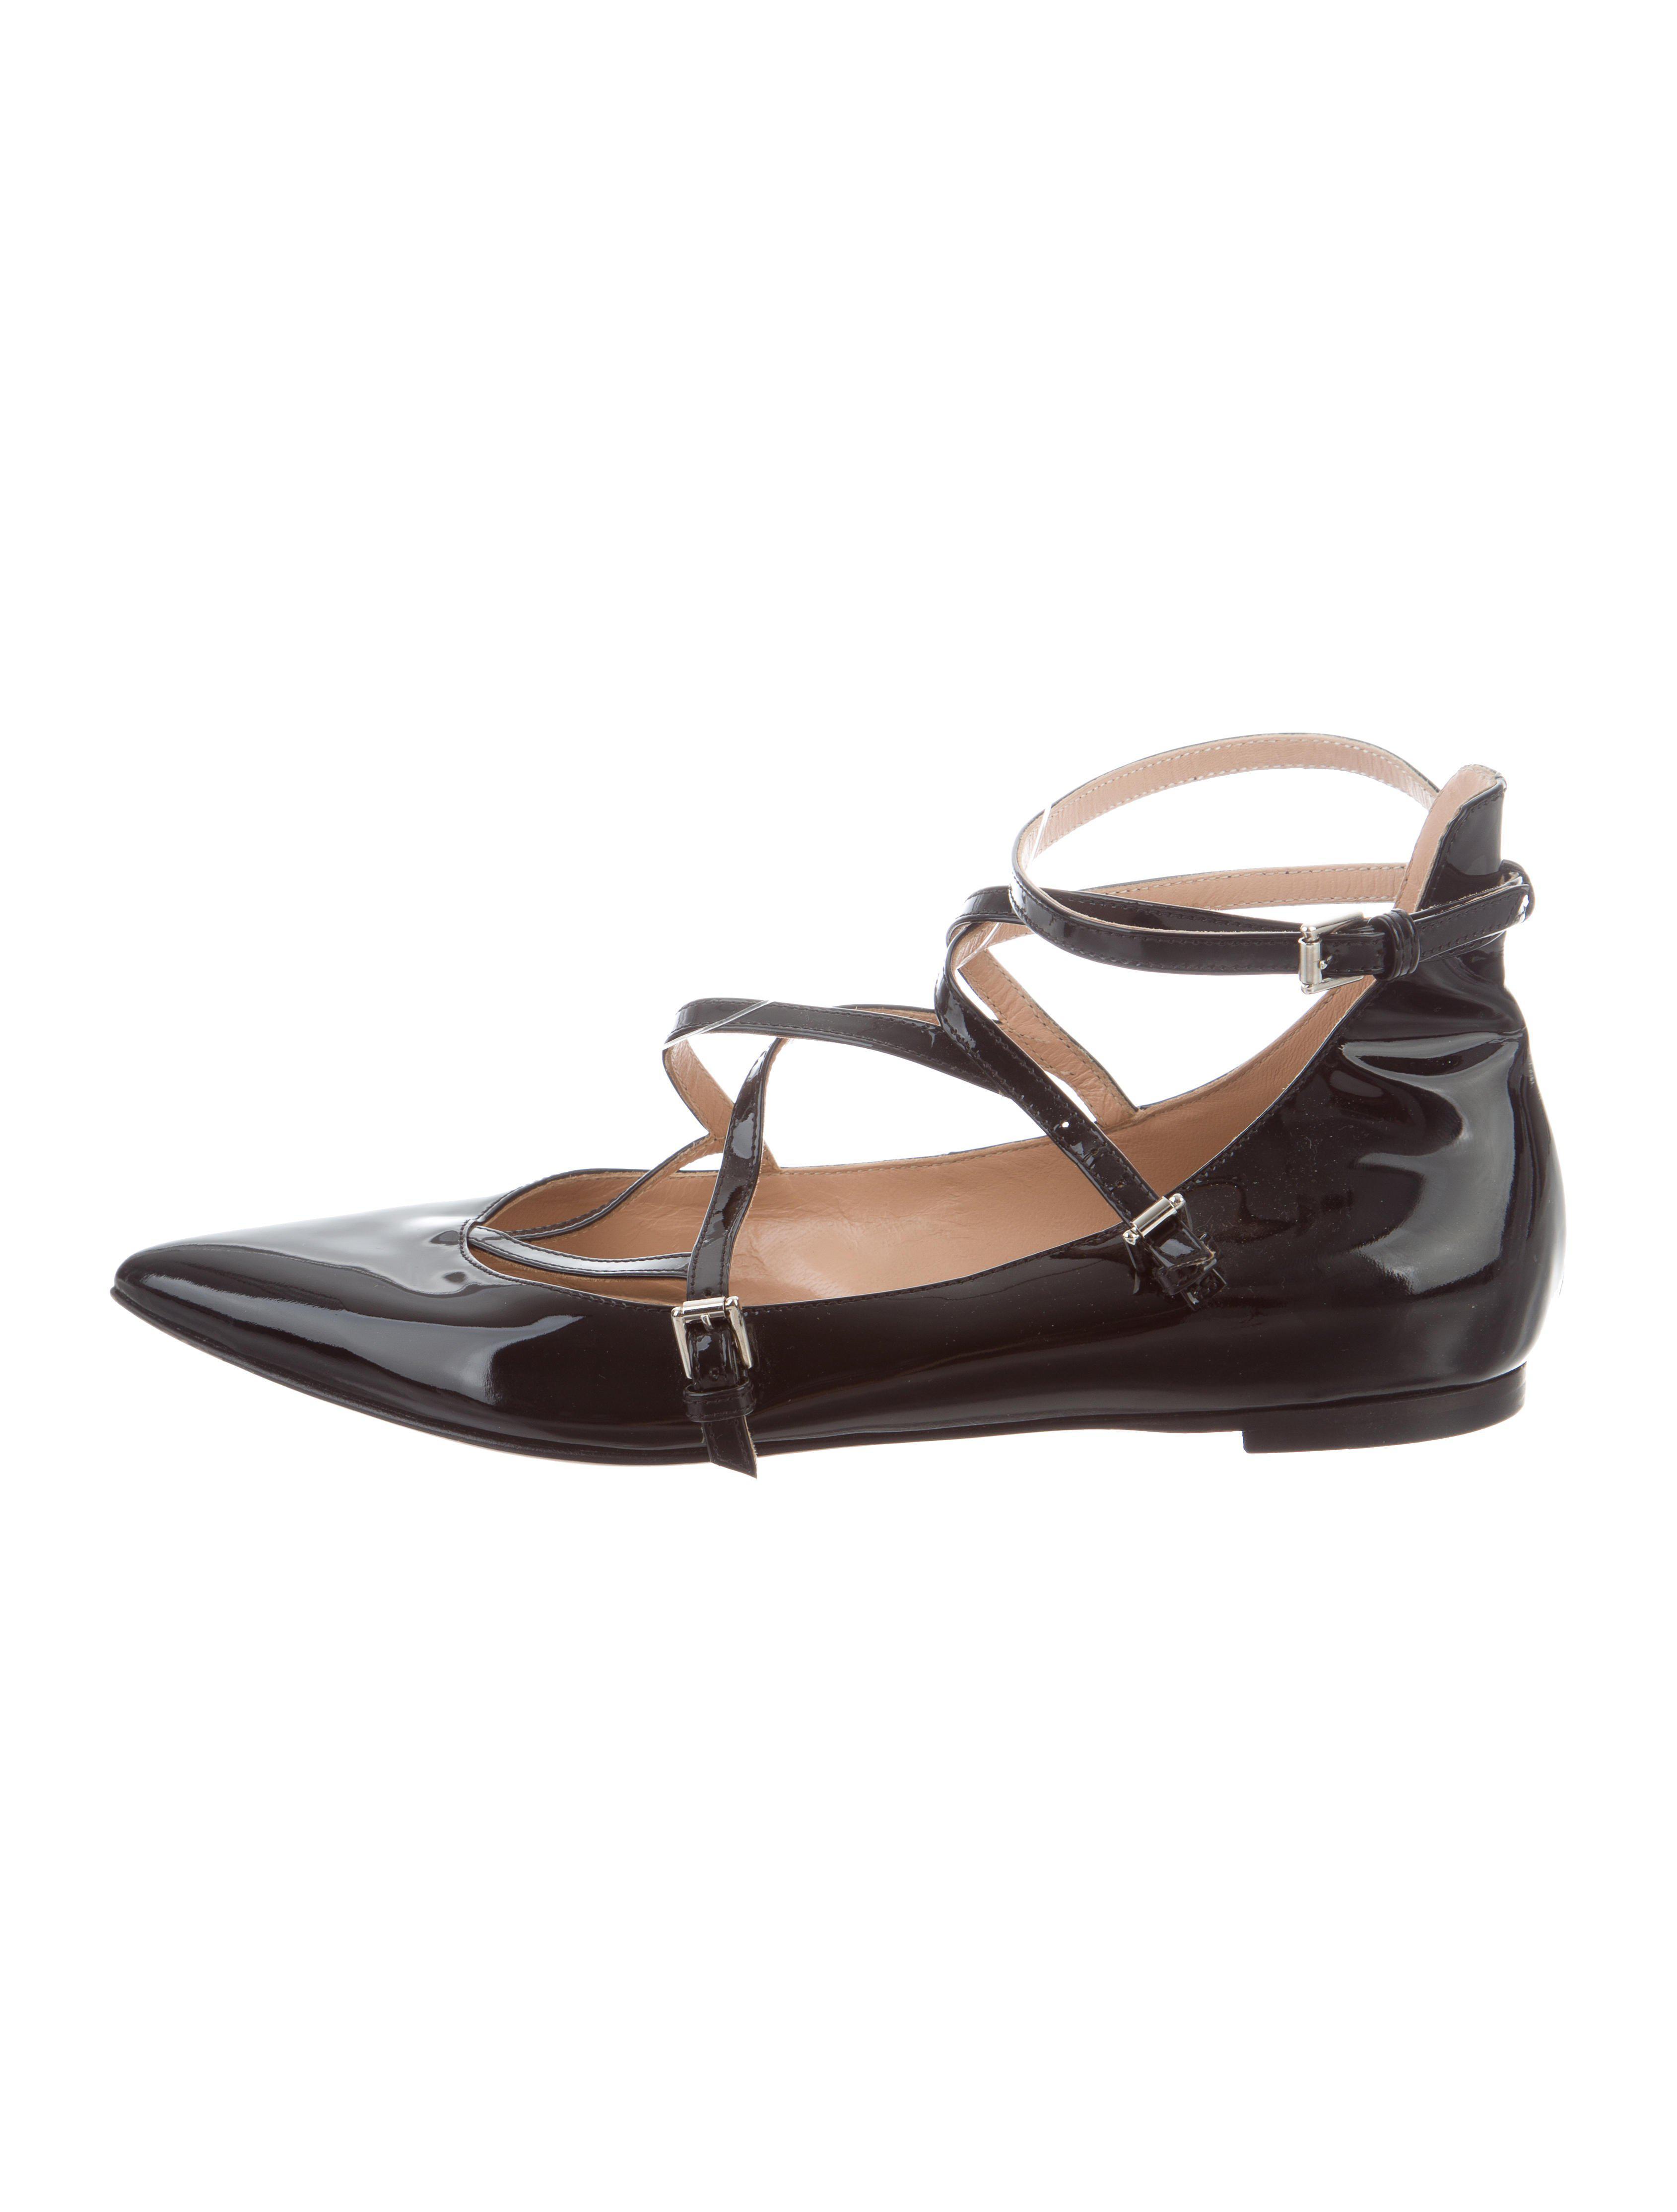 Gianvito Rossi Patent Leather Slingback Flats discount price GlNDf